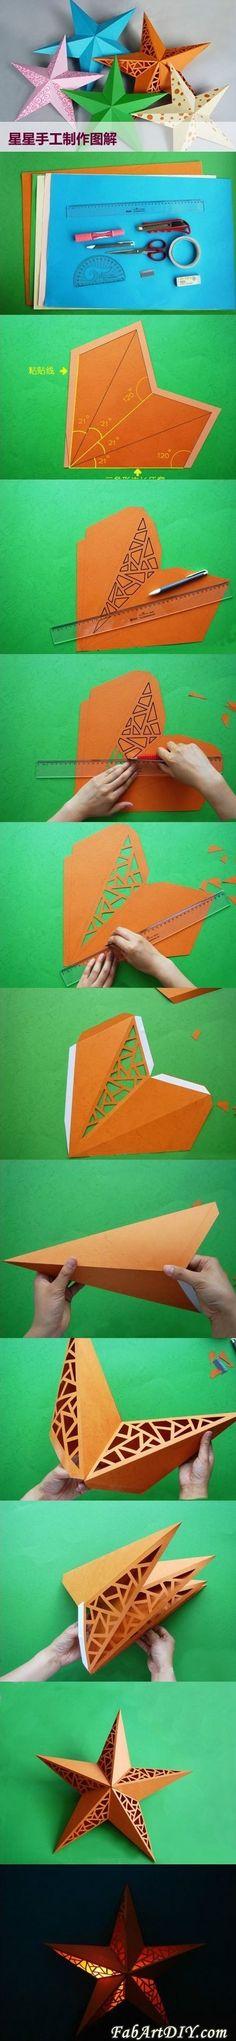 DIY Paper Star Lamp shade | www.FabArtDIY.com LIKE Us on Facebook ==> https://www.facebook.com/FabArtDIY